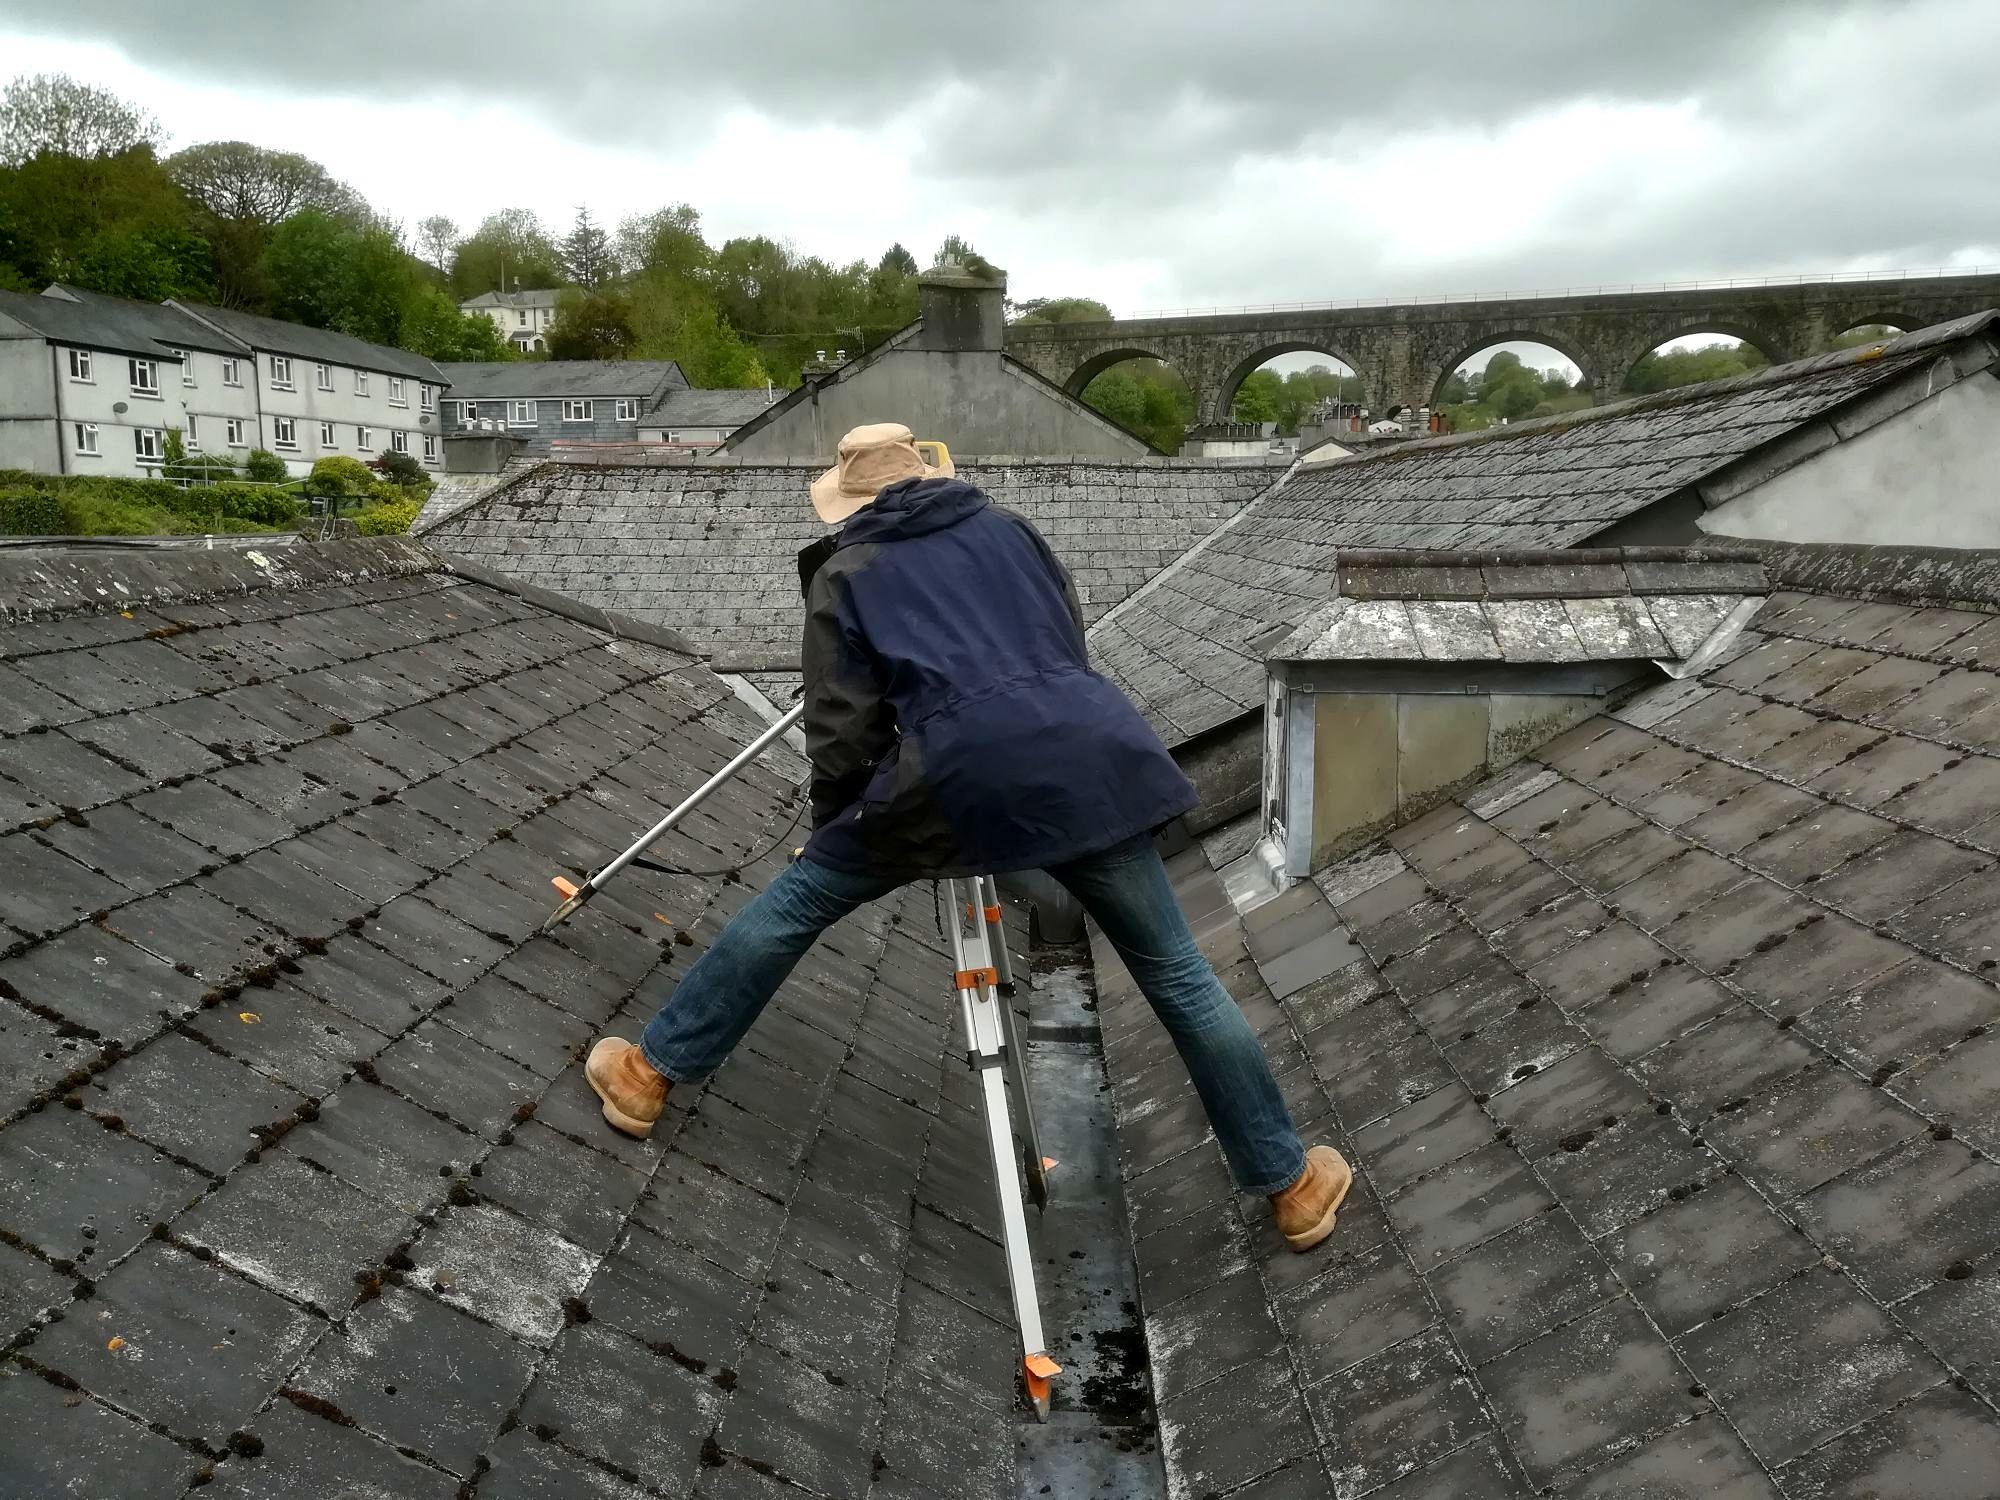 Surveying a roof in Tavistock, Devon